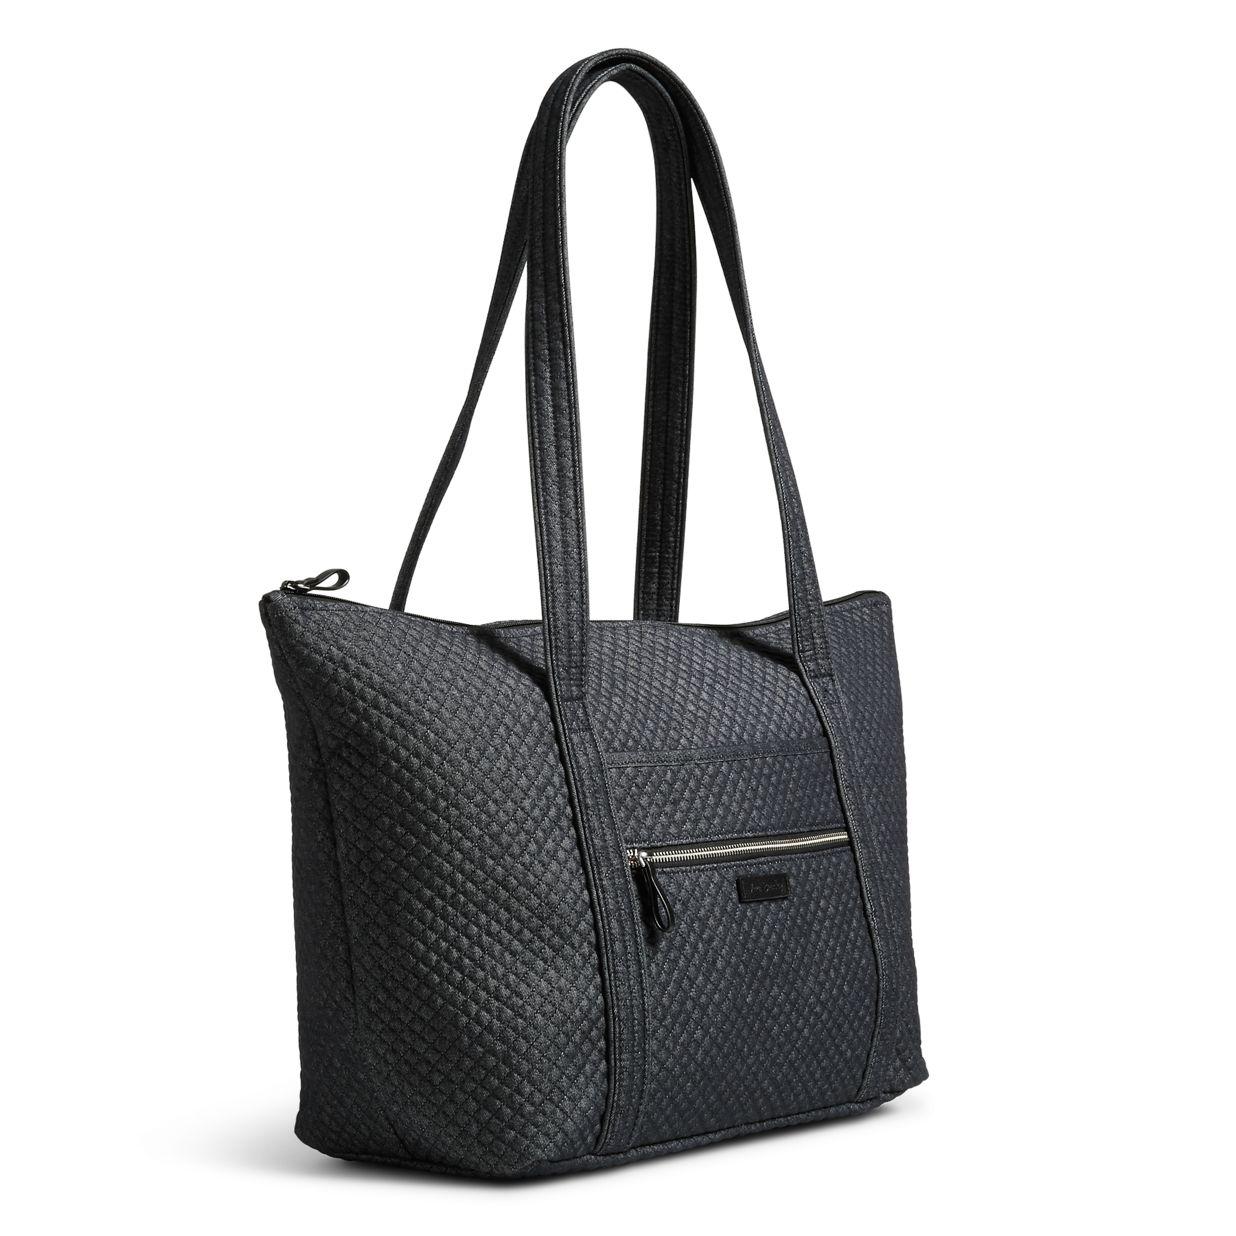 Miller Travel Bag Vera Bradley